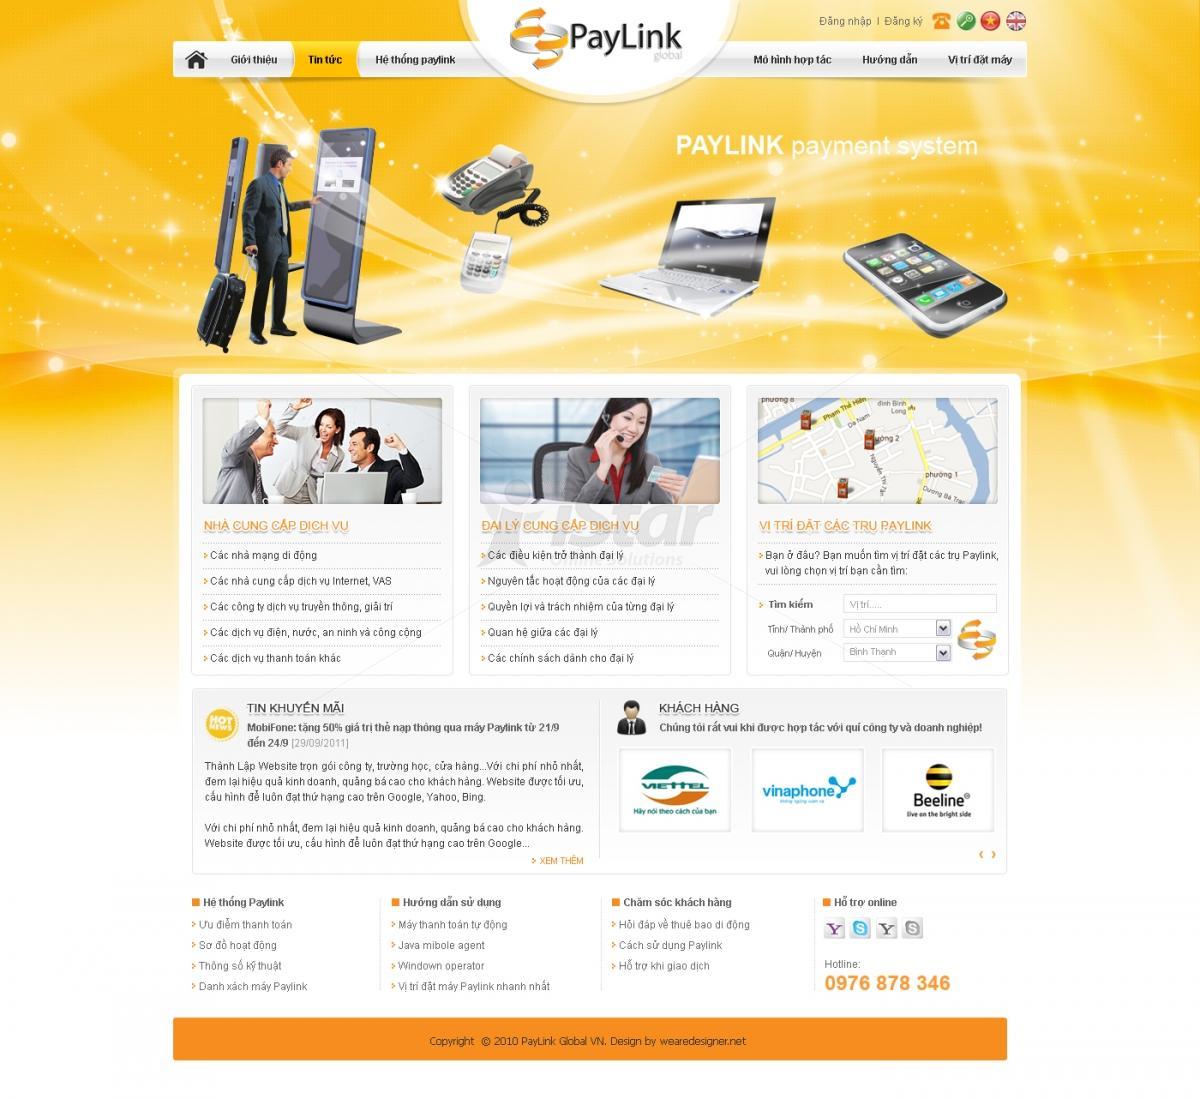 thiết kế website, thiet ke website, thiết kế web, thiet ke web, drupal, website